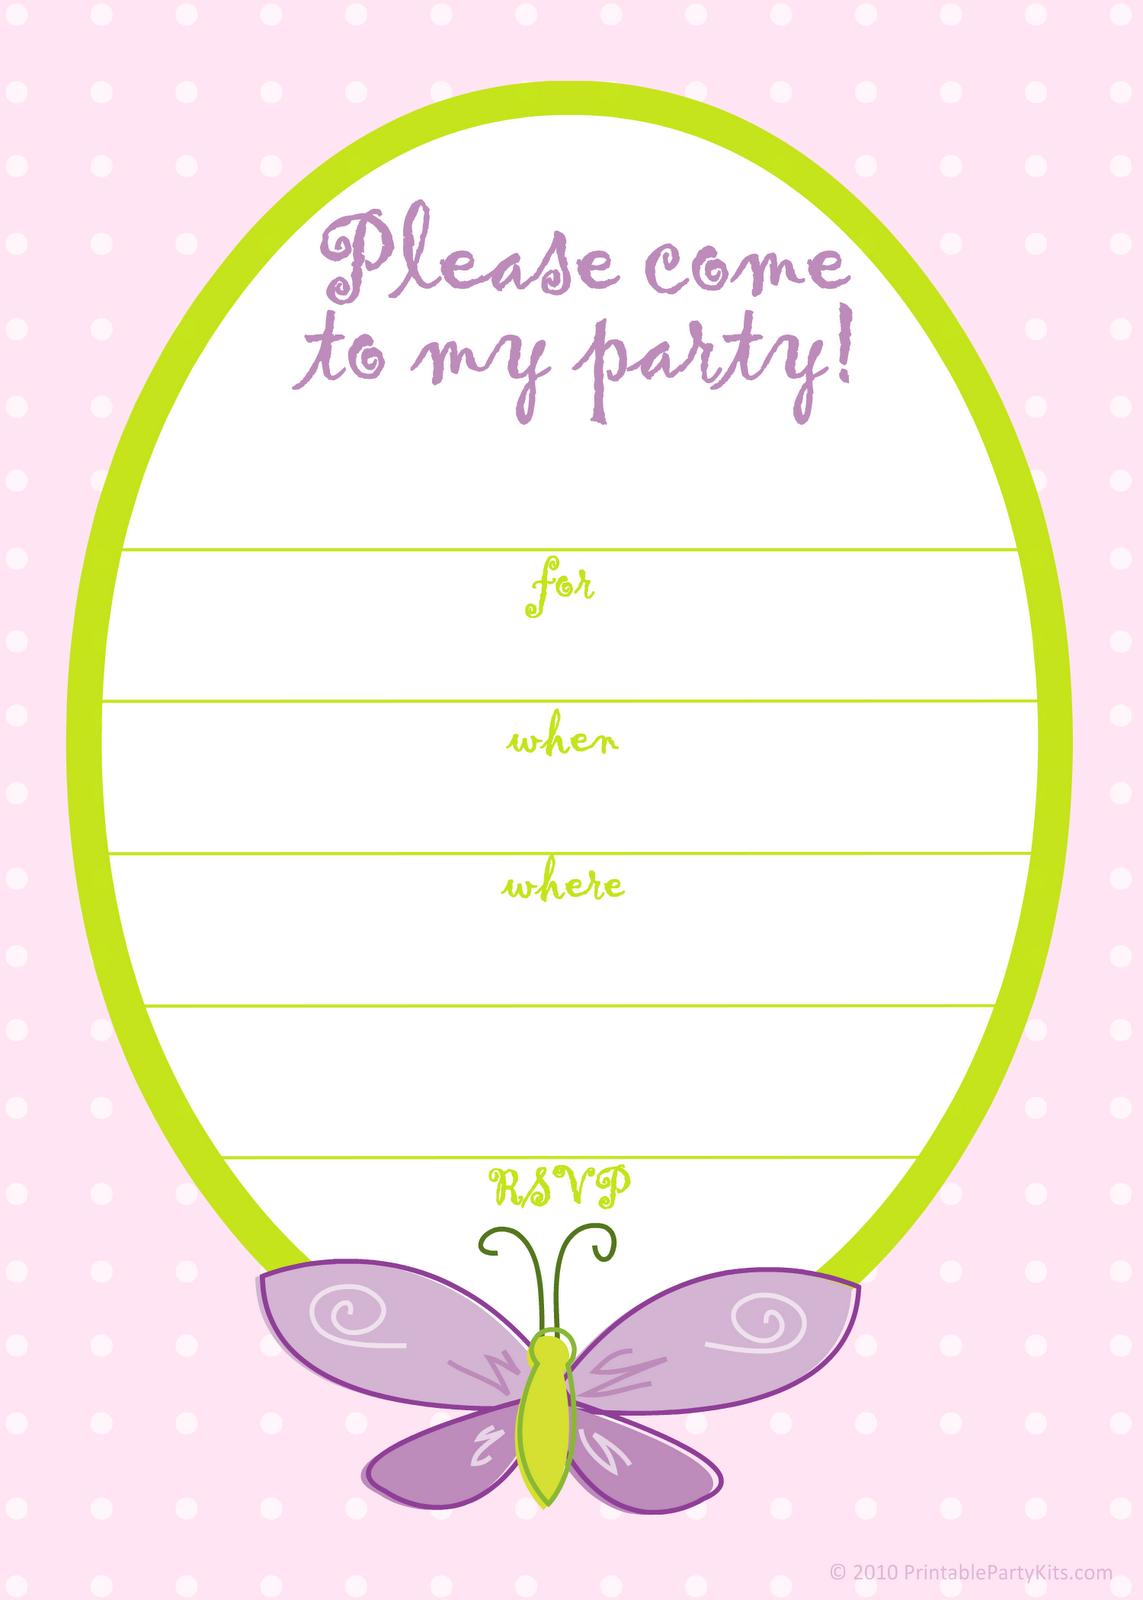 Free Printable Birthday Card Invitation Templates | Invitations In - Free Printable Birthday Invitation Cards